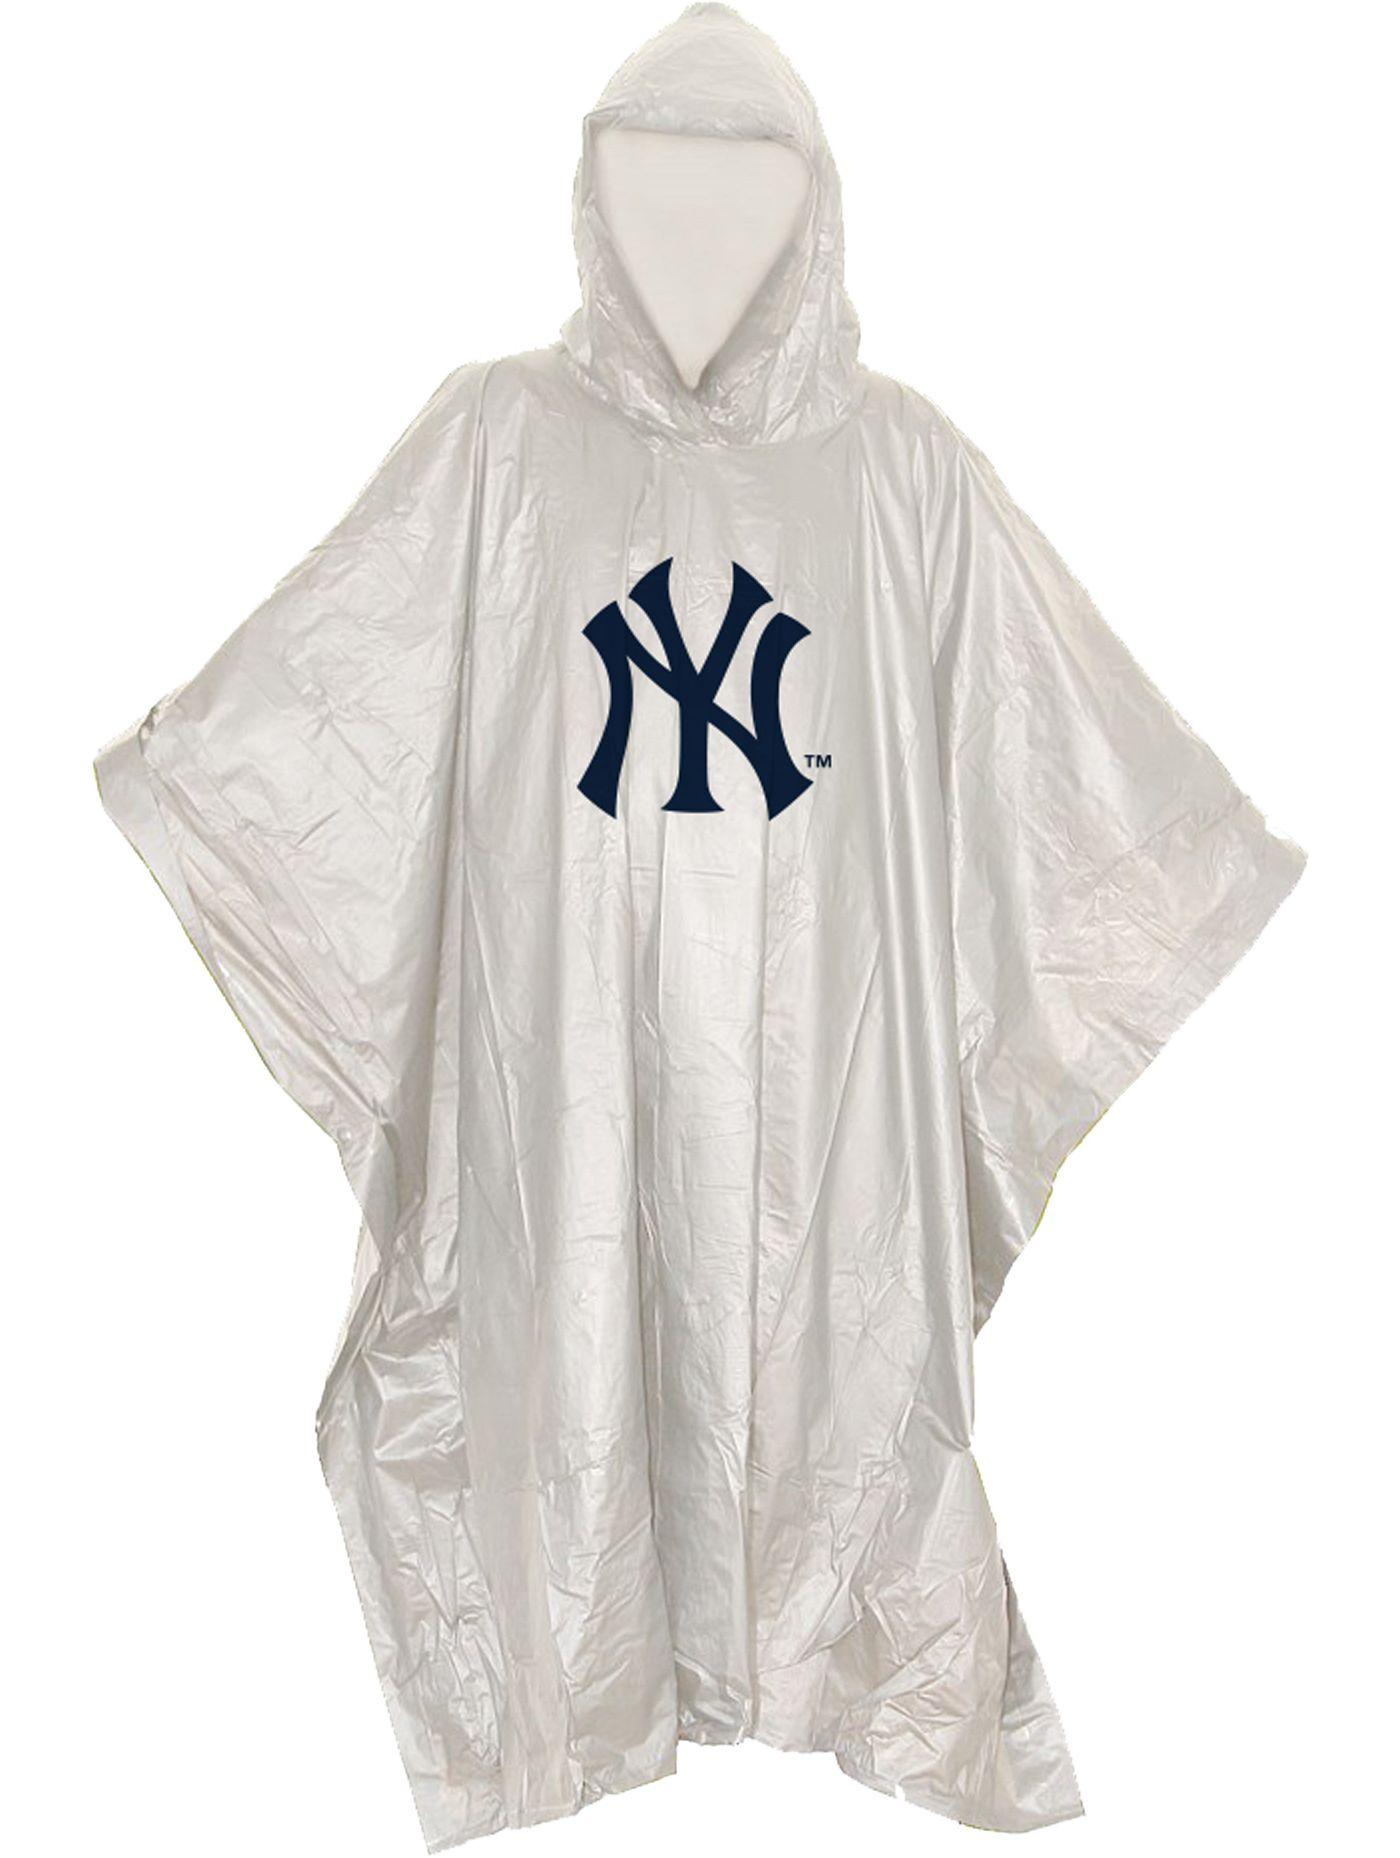 Northwest New York Yankees Clear Poncho